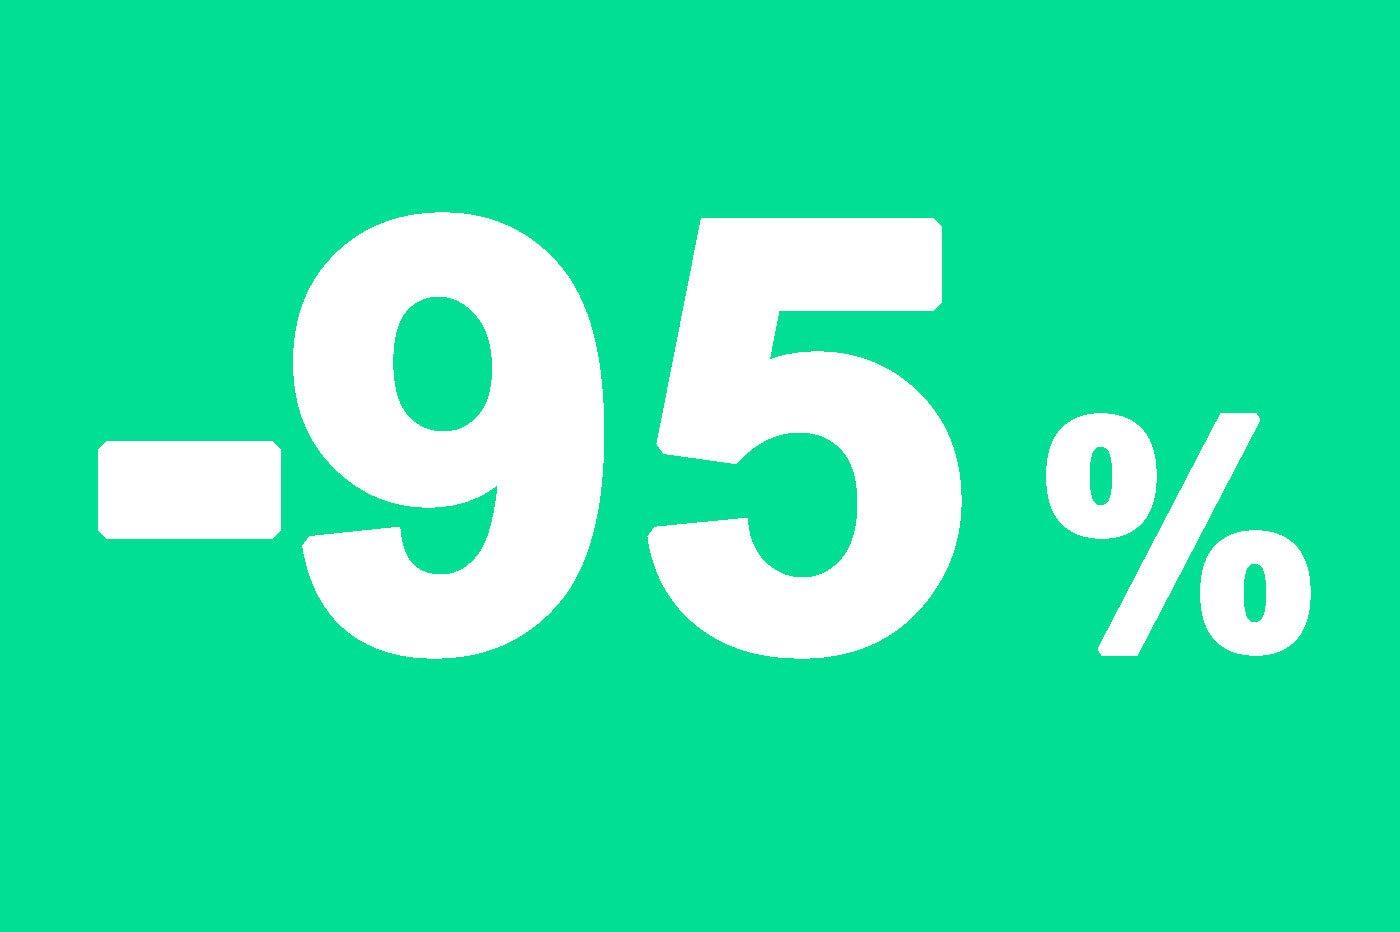 Forfait mobile 95%